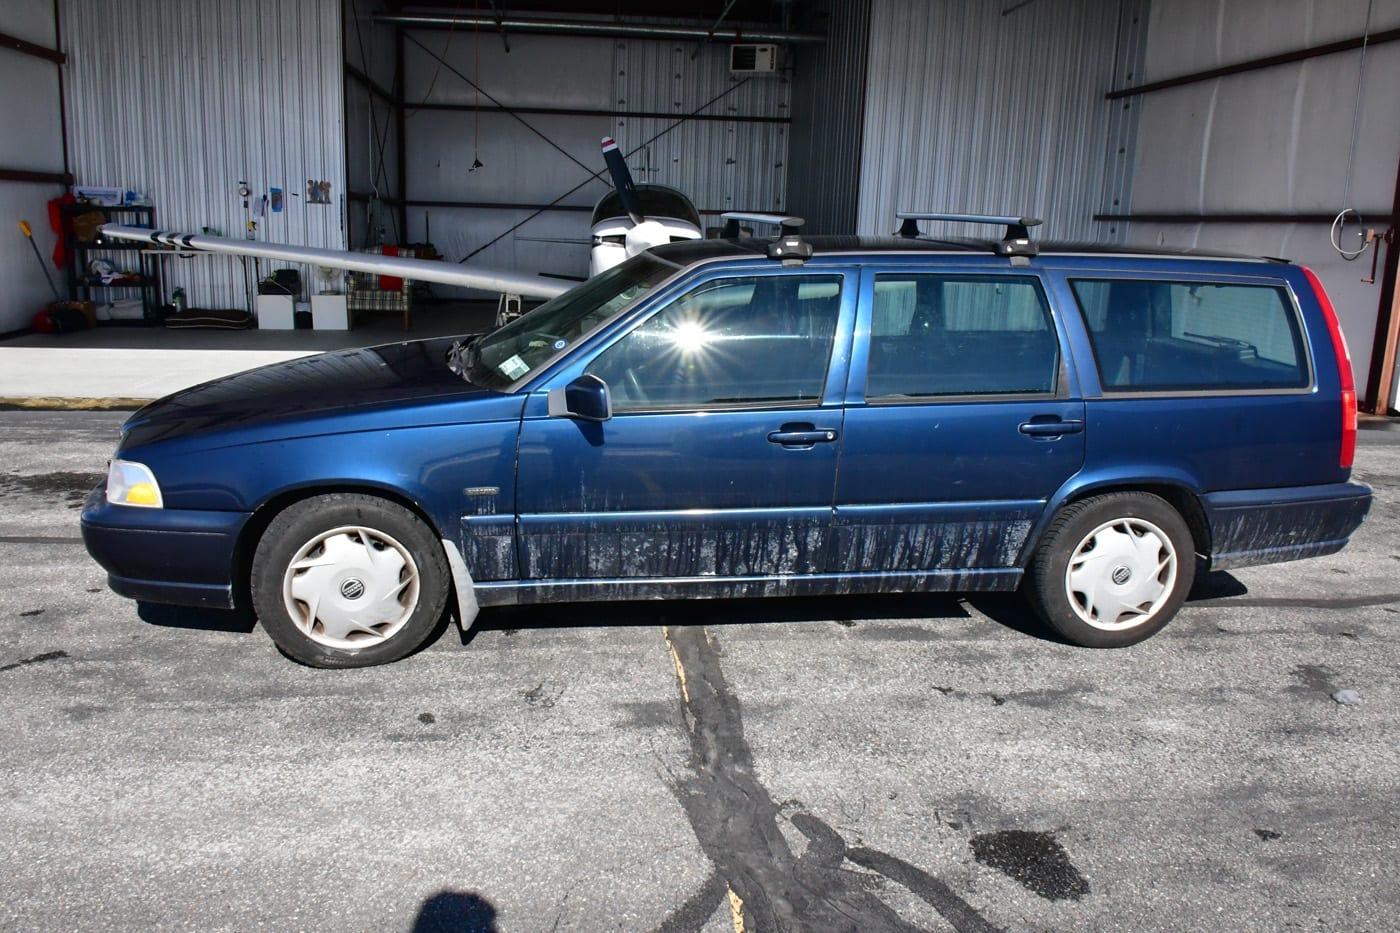 volvo v70 perua station wagon placa new york 3